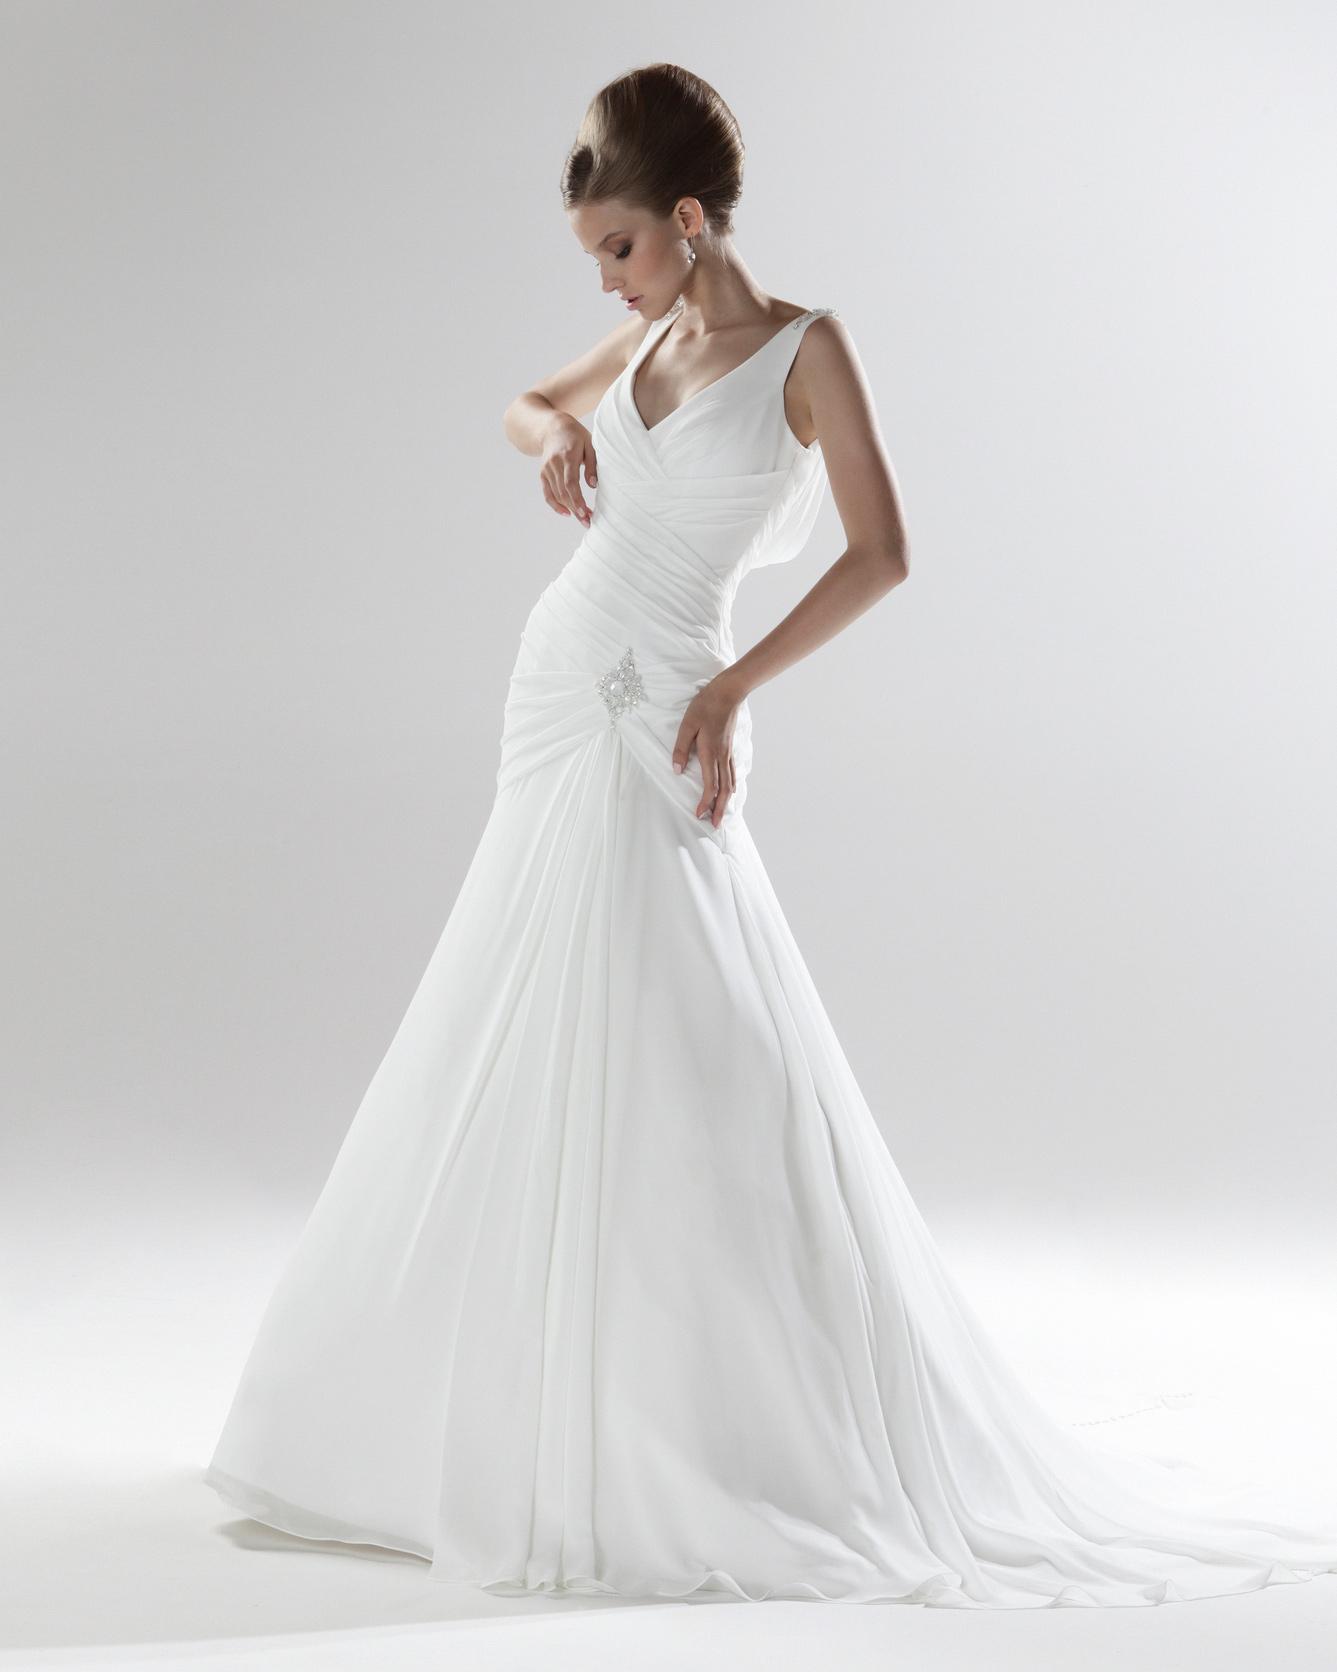 ellis-bridal-11129.jpg